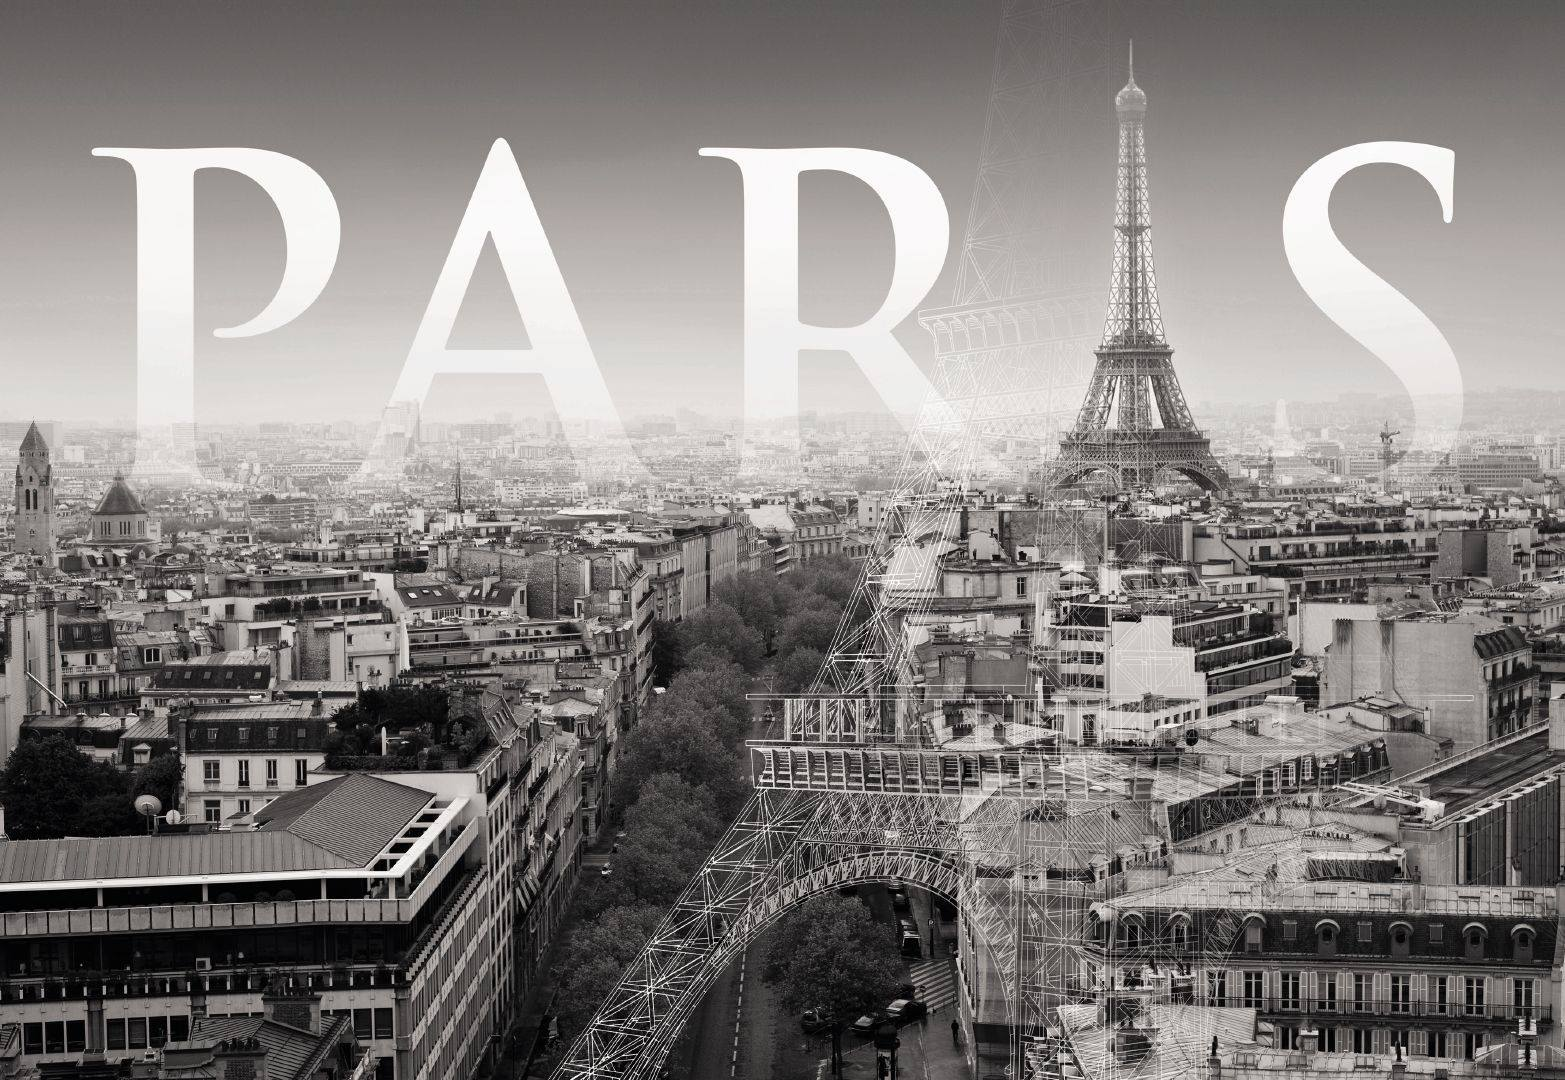 Kashmir Council EU condemns terrorist attacks in France#Paris